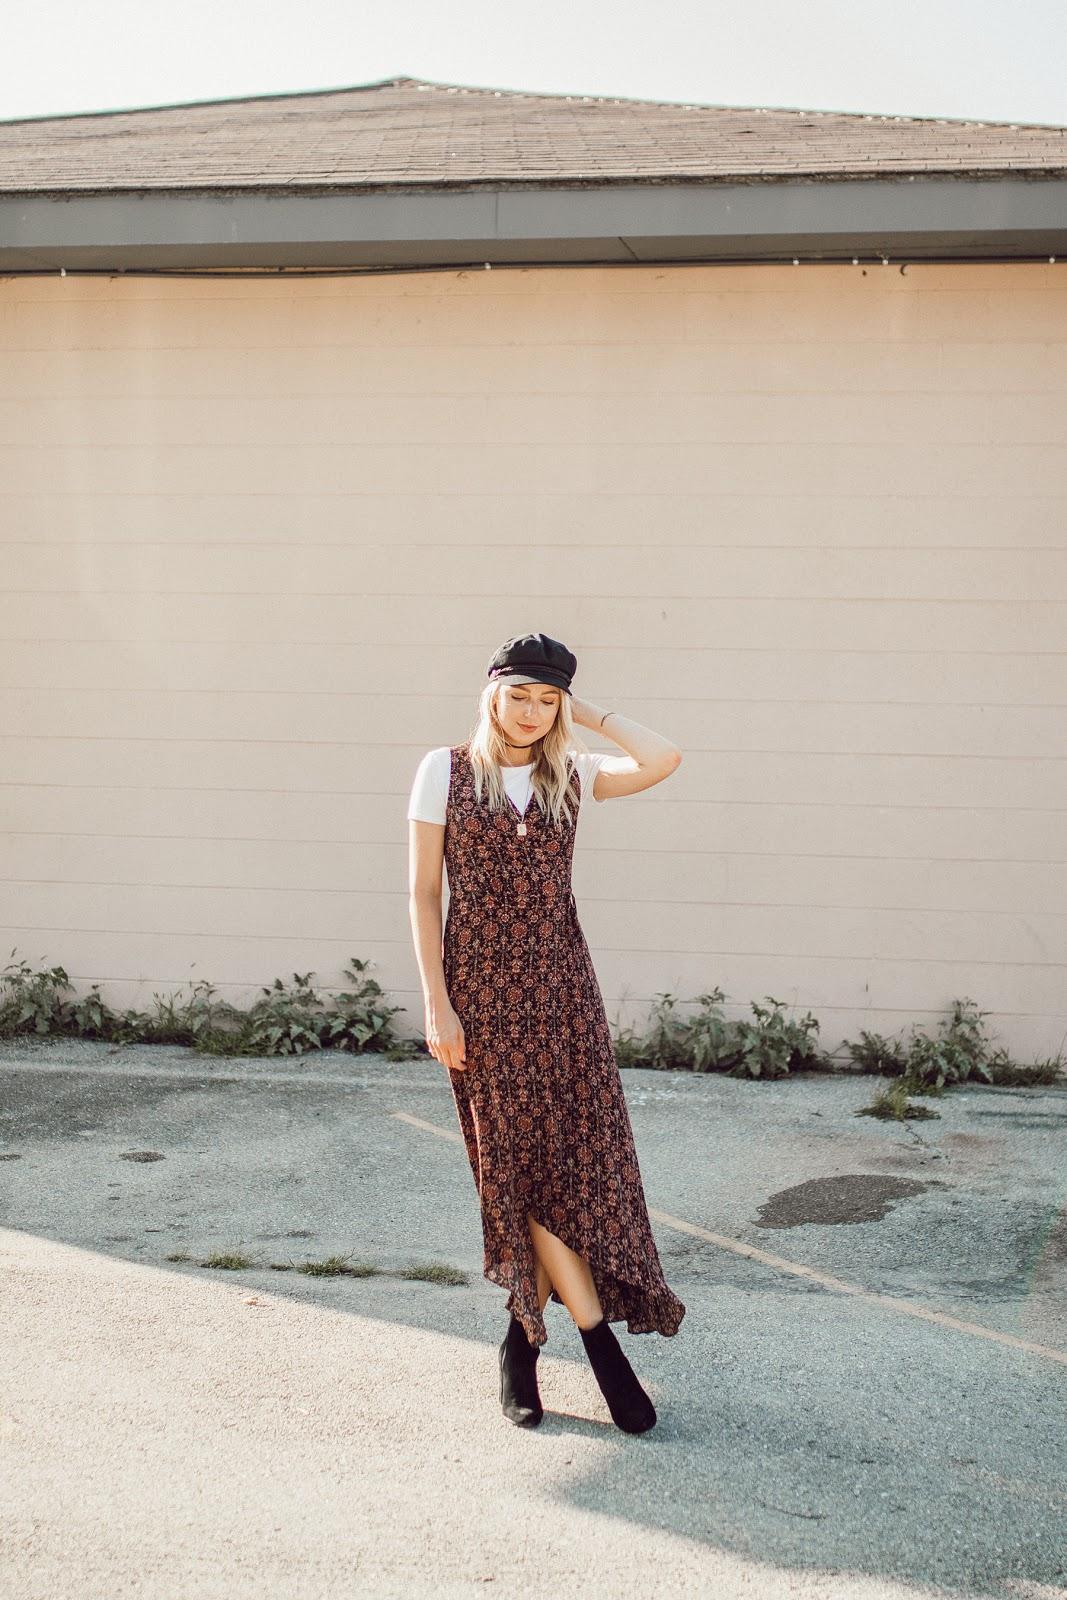 Lulu's print wrap dress, layered over a tee